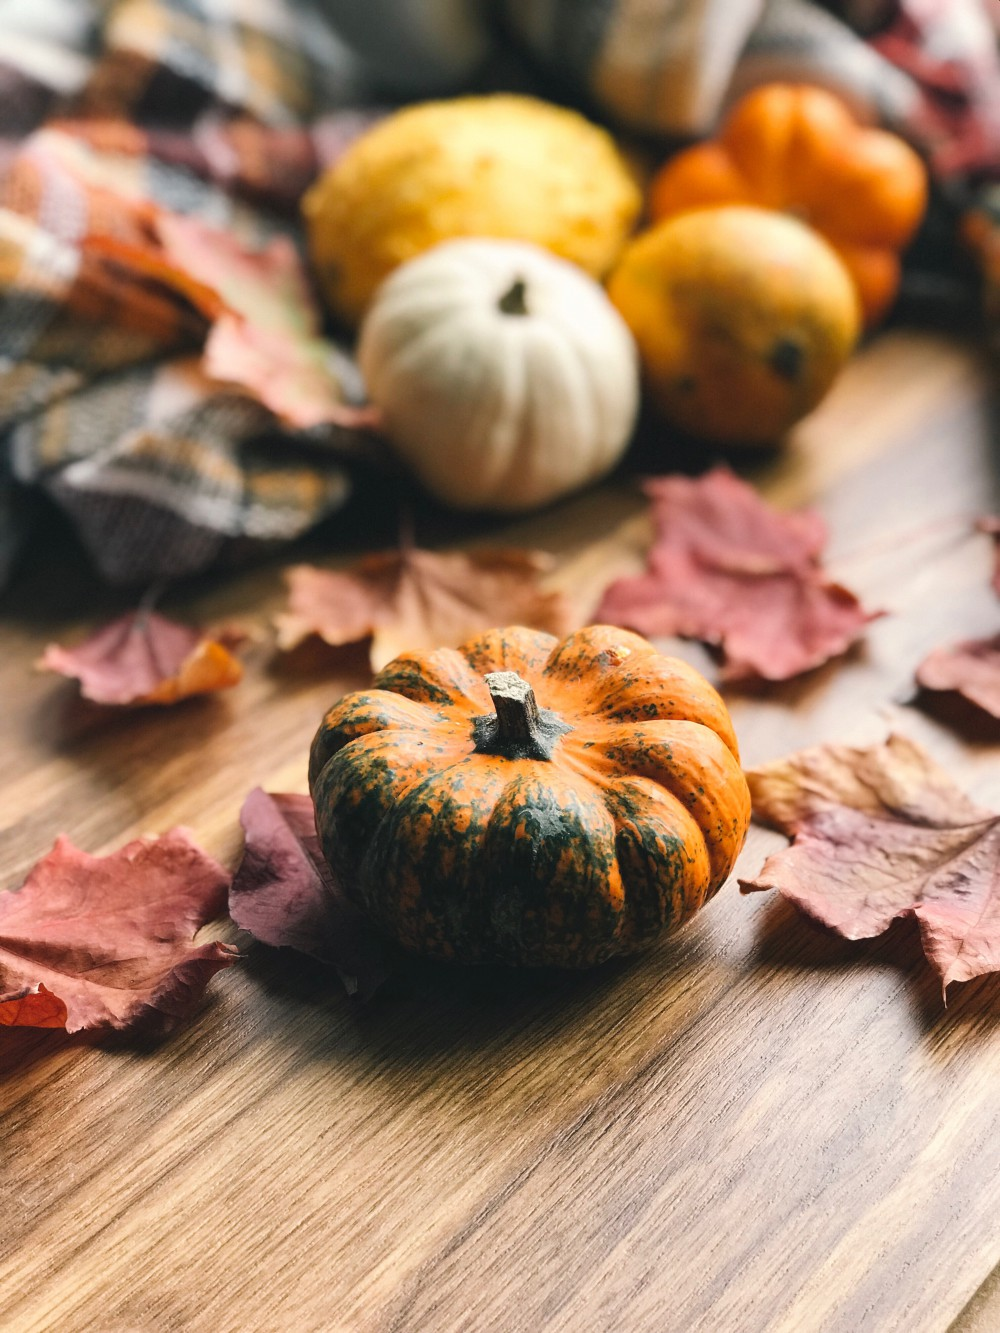 Autumn produce - Pumpkins